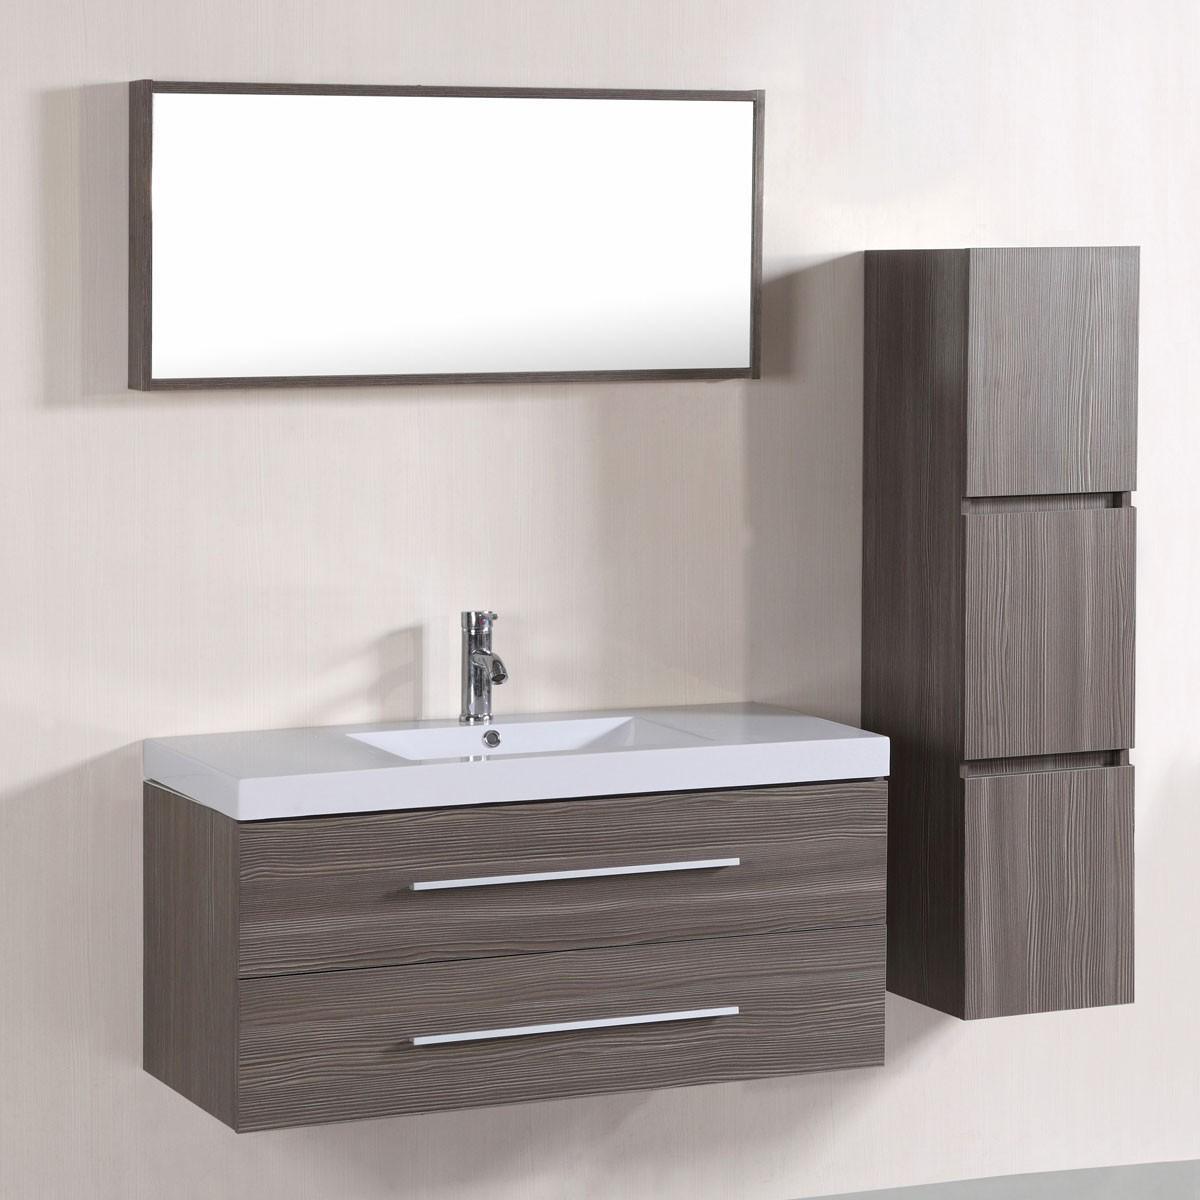 bathroom vanities set. 40 In. Wall-Mount Bathroom Vanity Set With Single Sink And Mirror (DK Vanities